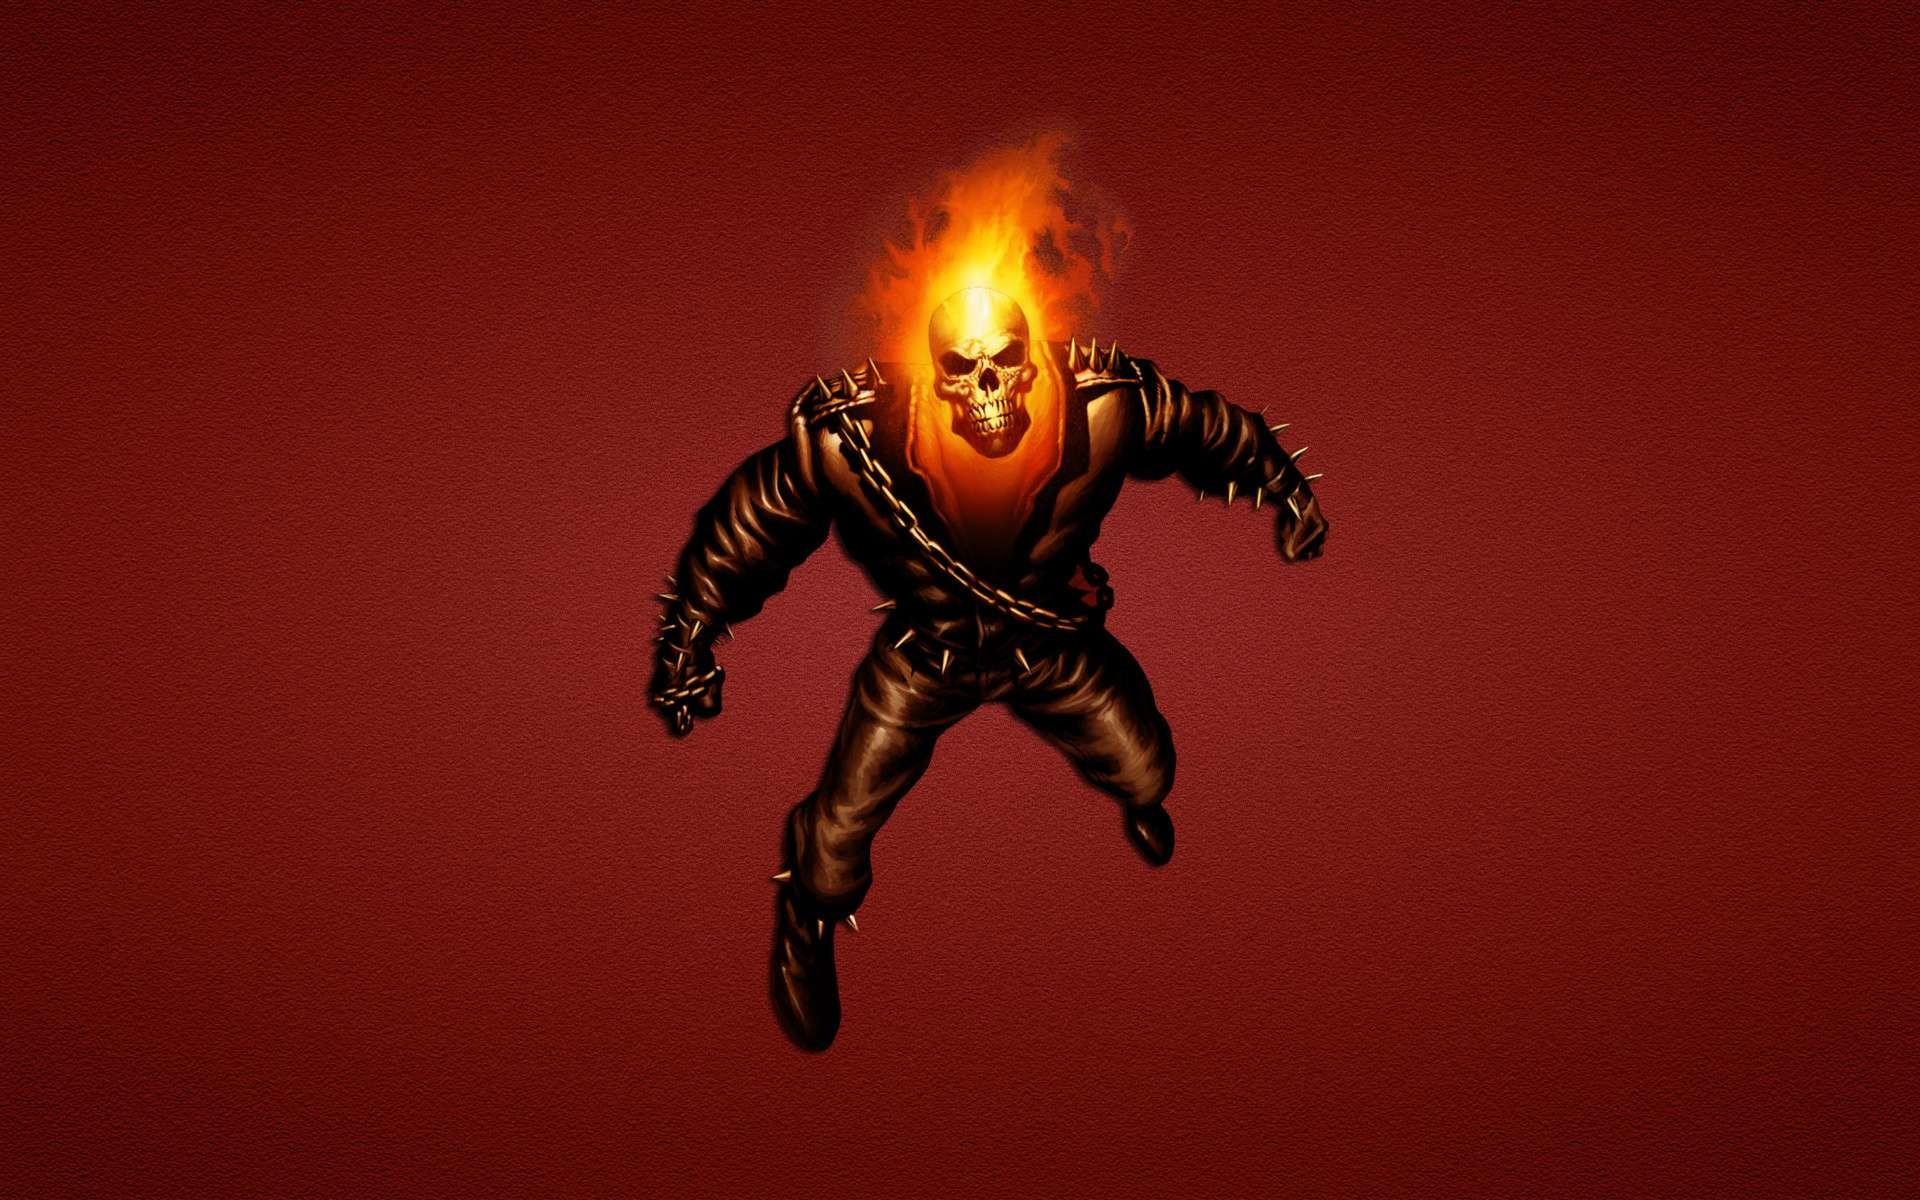 Fantastic Wallpaper Mobile Ghost Rider - 742456-ghost-rider-wallpaper-hd-1920x1200-mobile  Photograph_924751.jpg